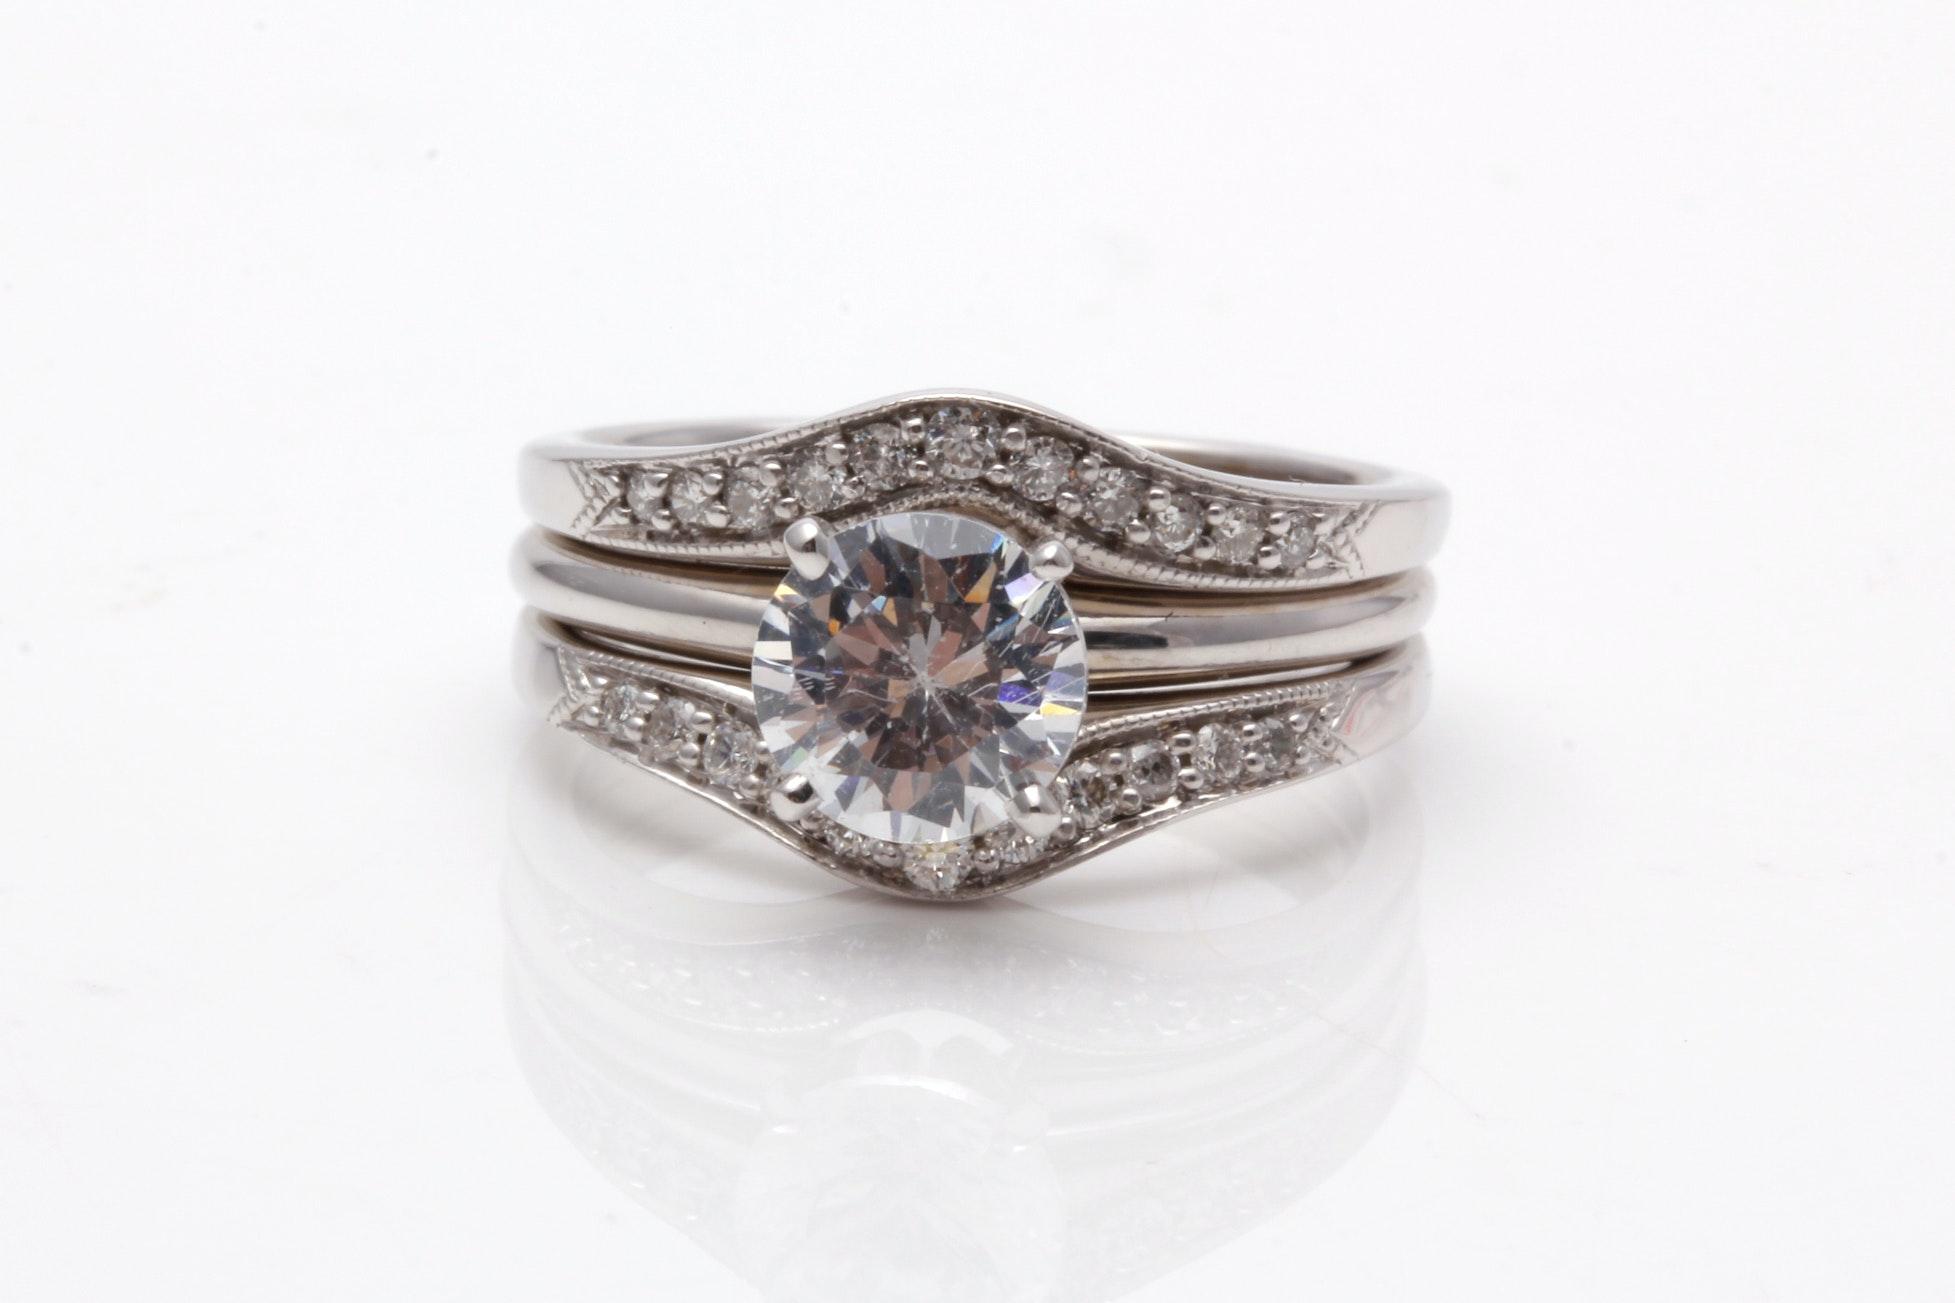 14K White Gold Semi Mount Diamond Bridal Ring With Cubic Zirconia Center Stone